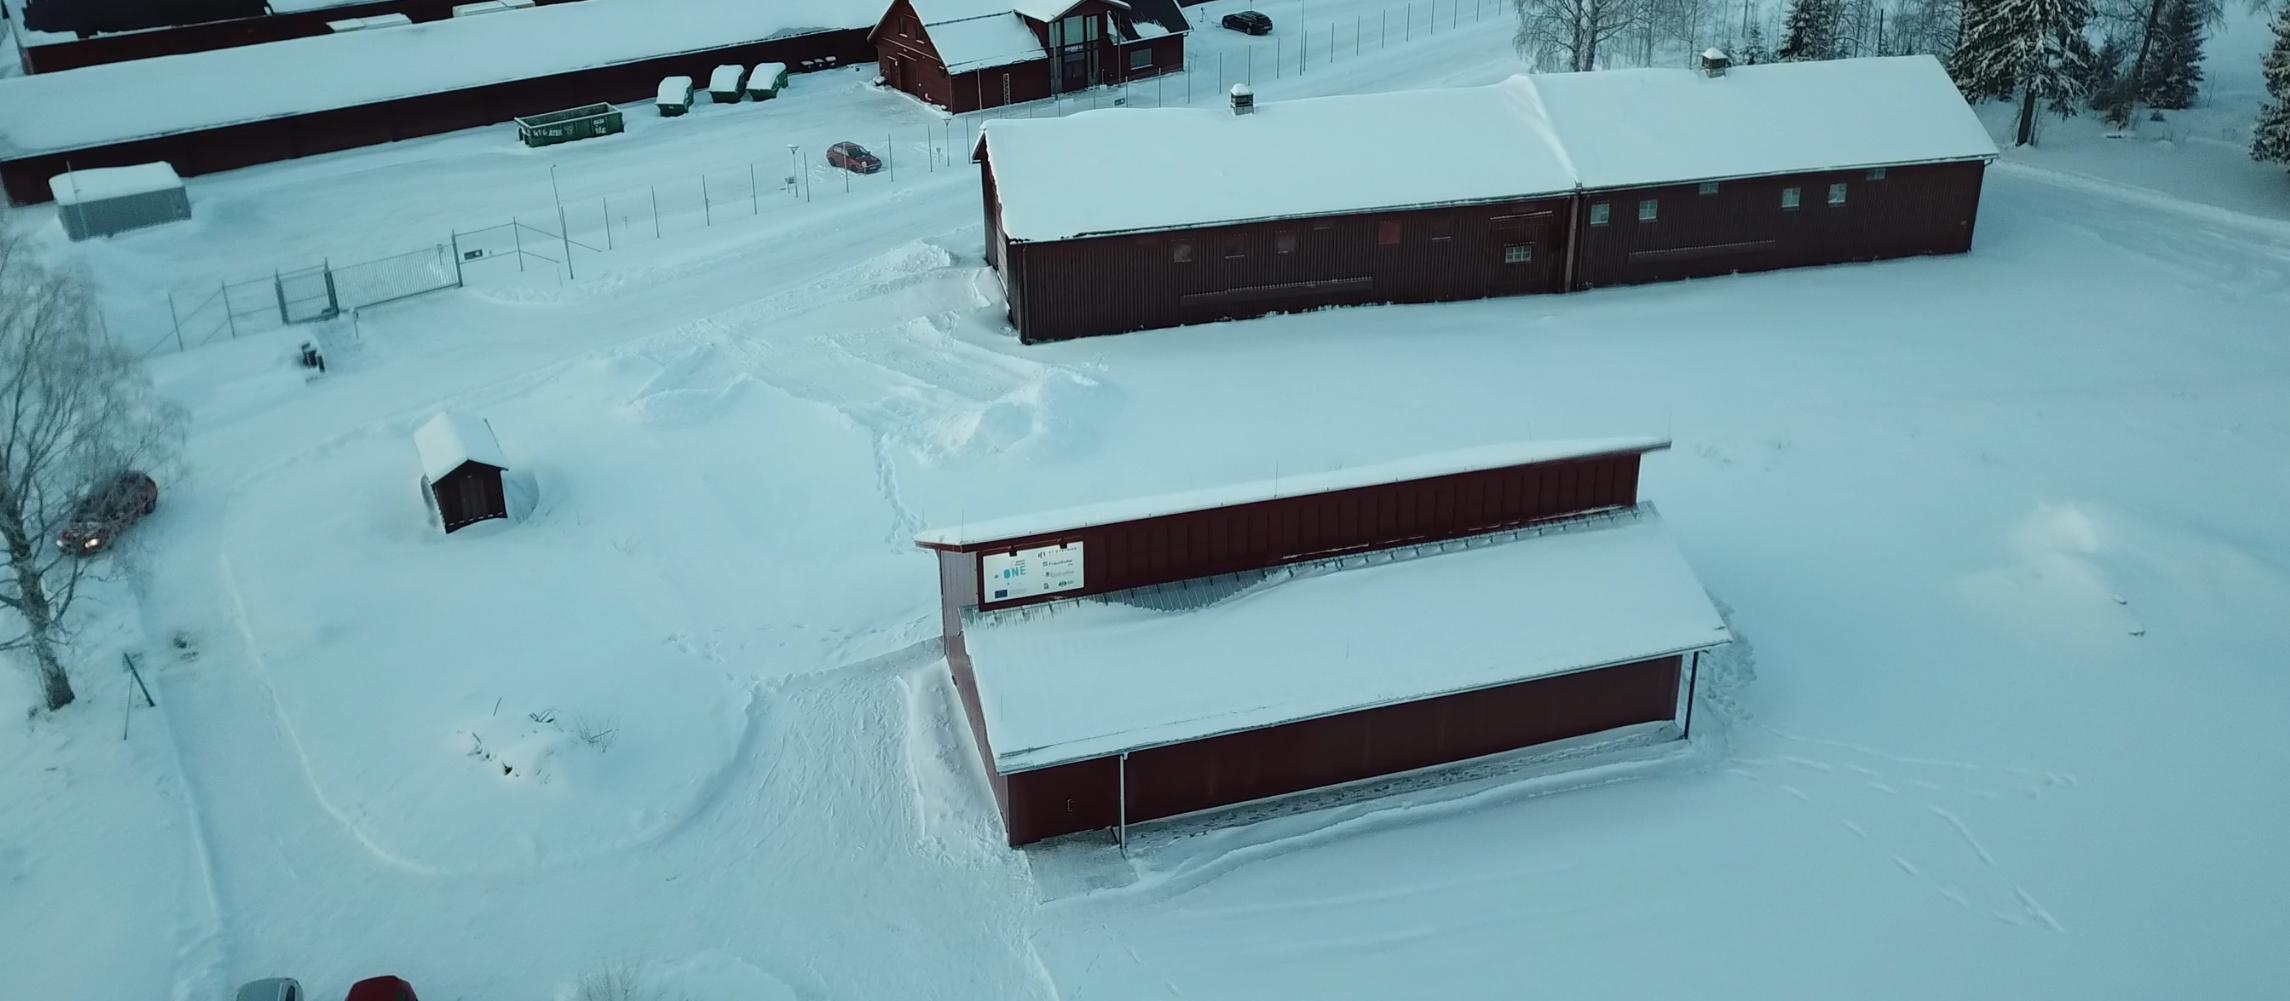 BTDC One Winter 2019